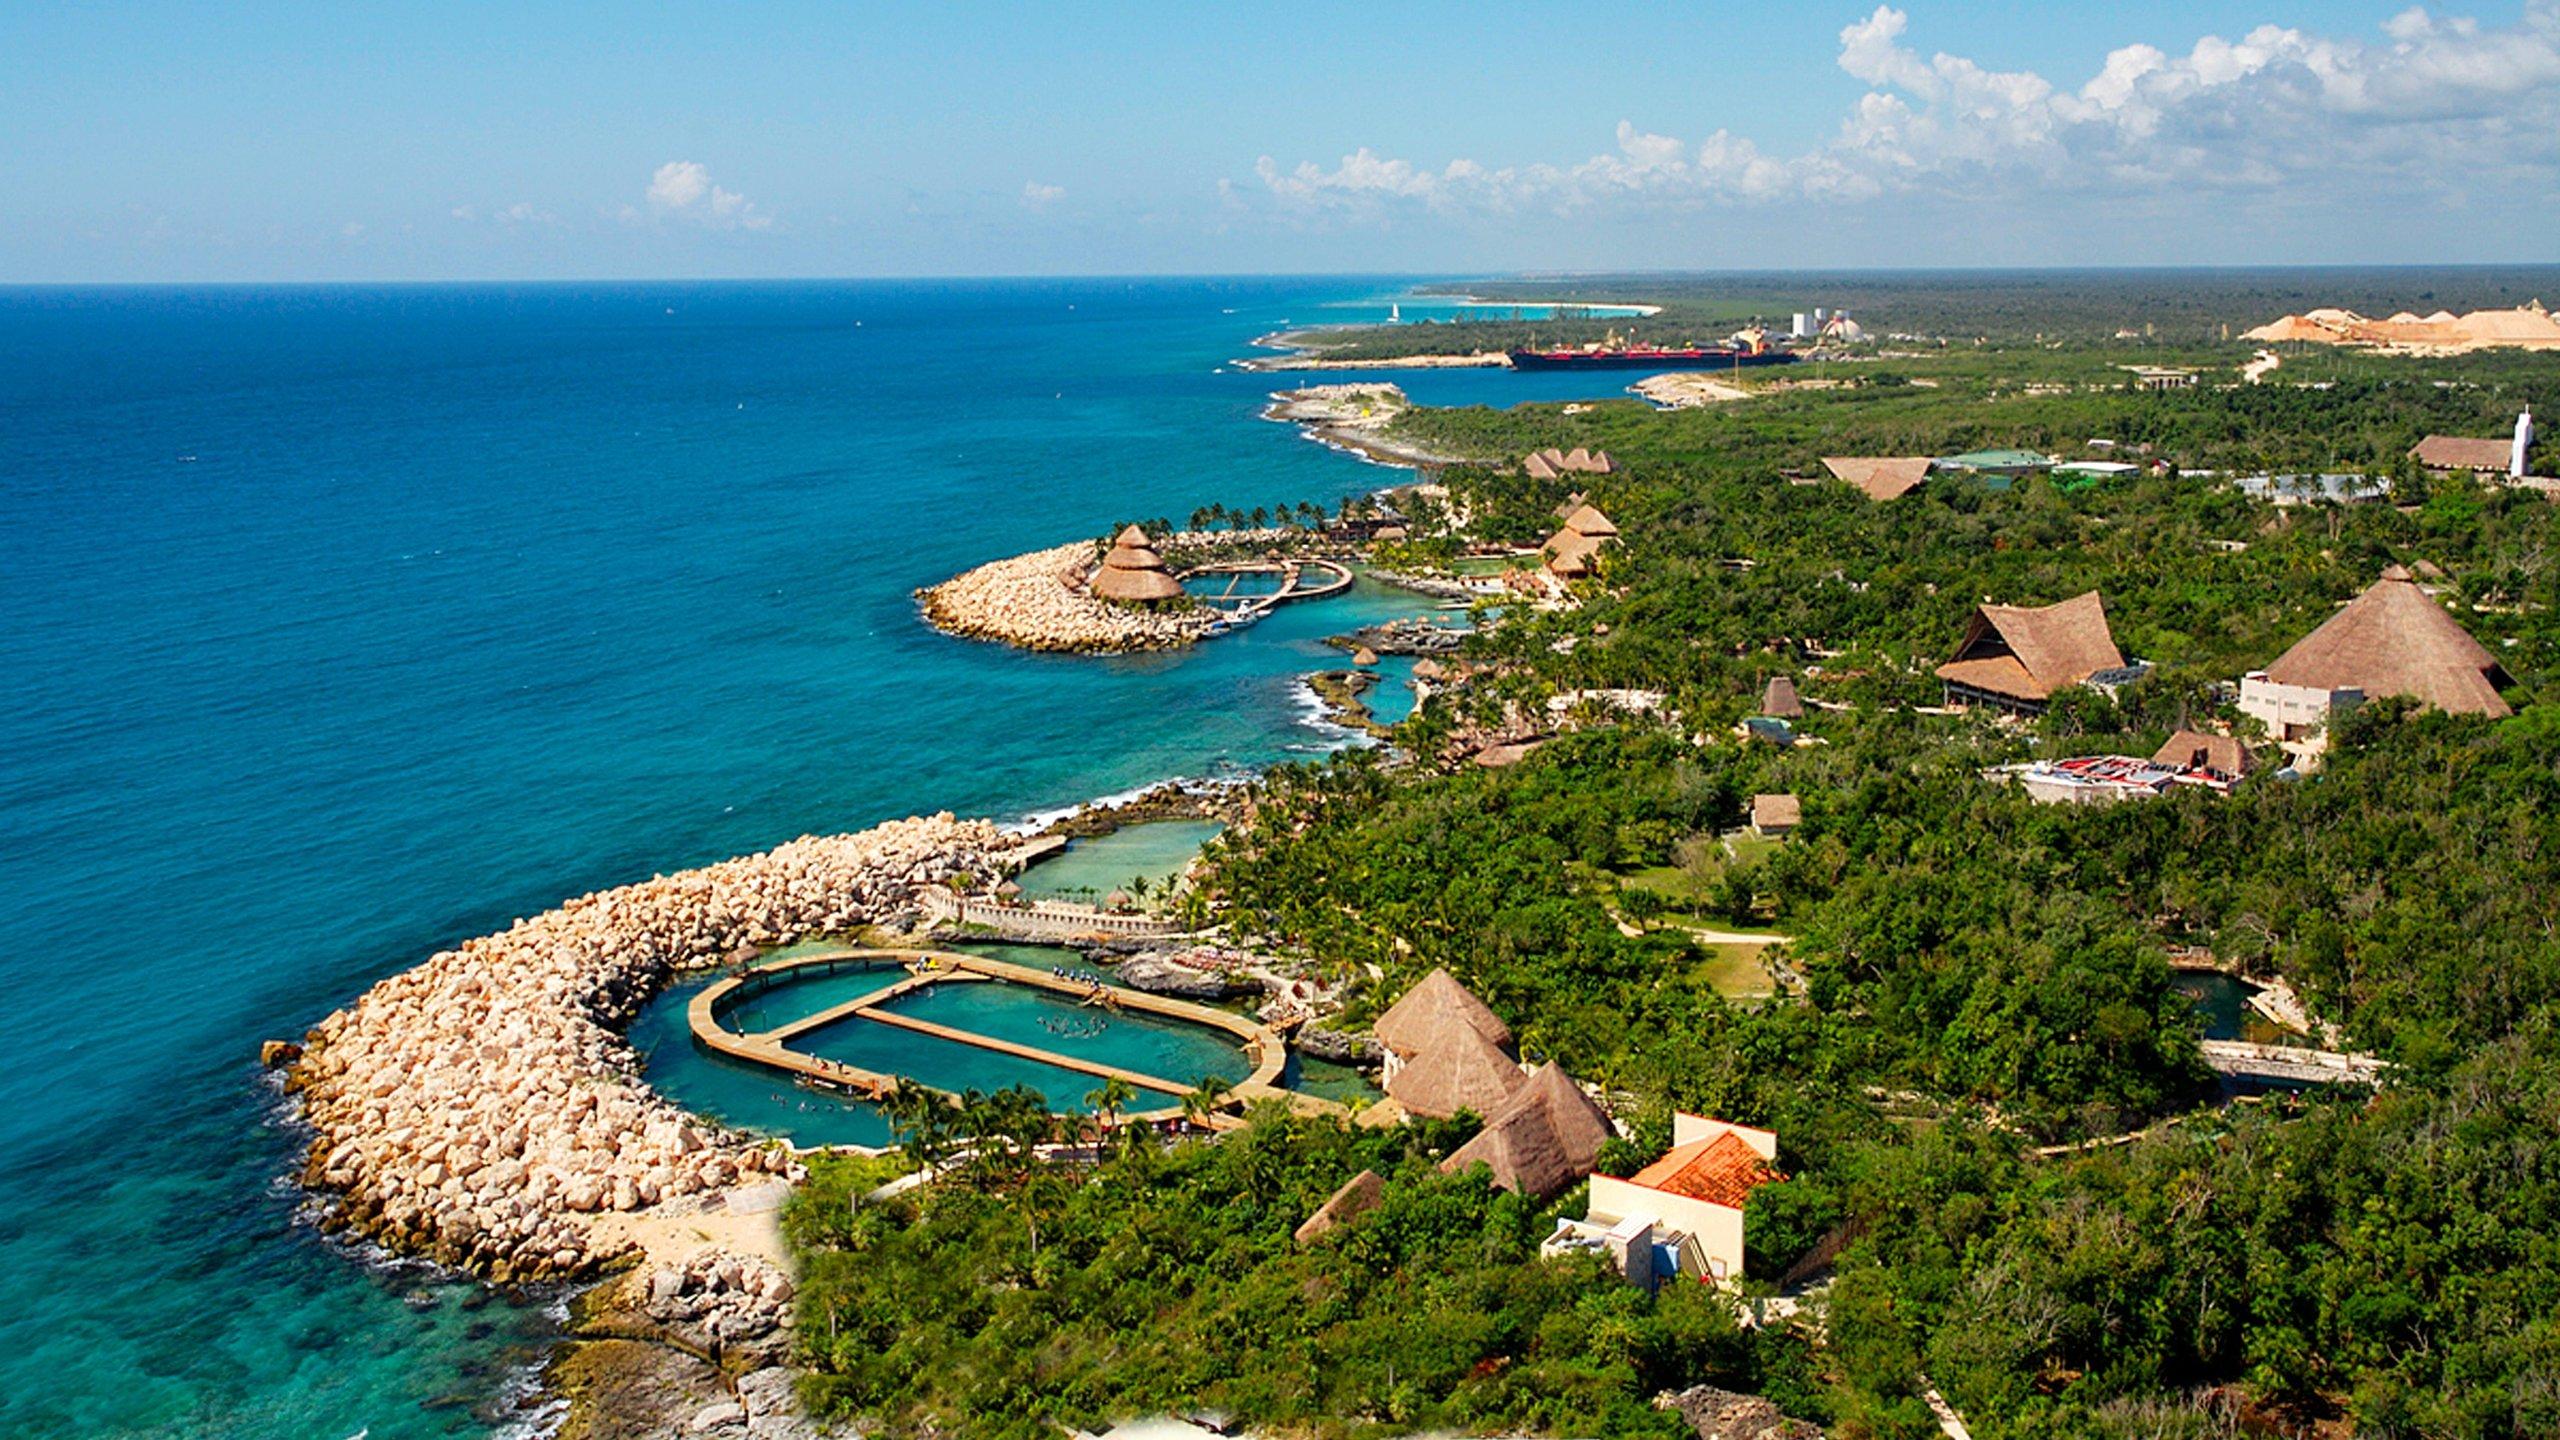 Xcaret Eco Theme Park, Playa del Carmen, Quintana Roo, Mexico